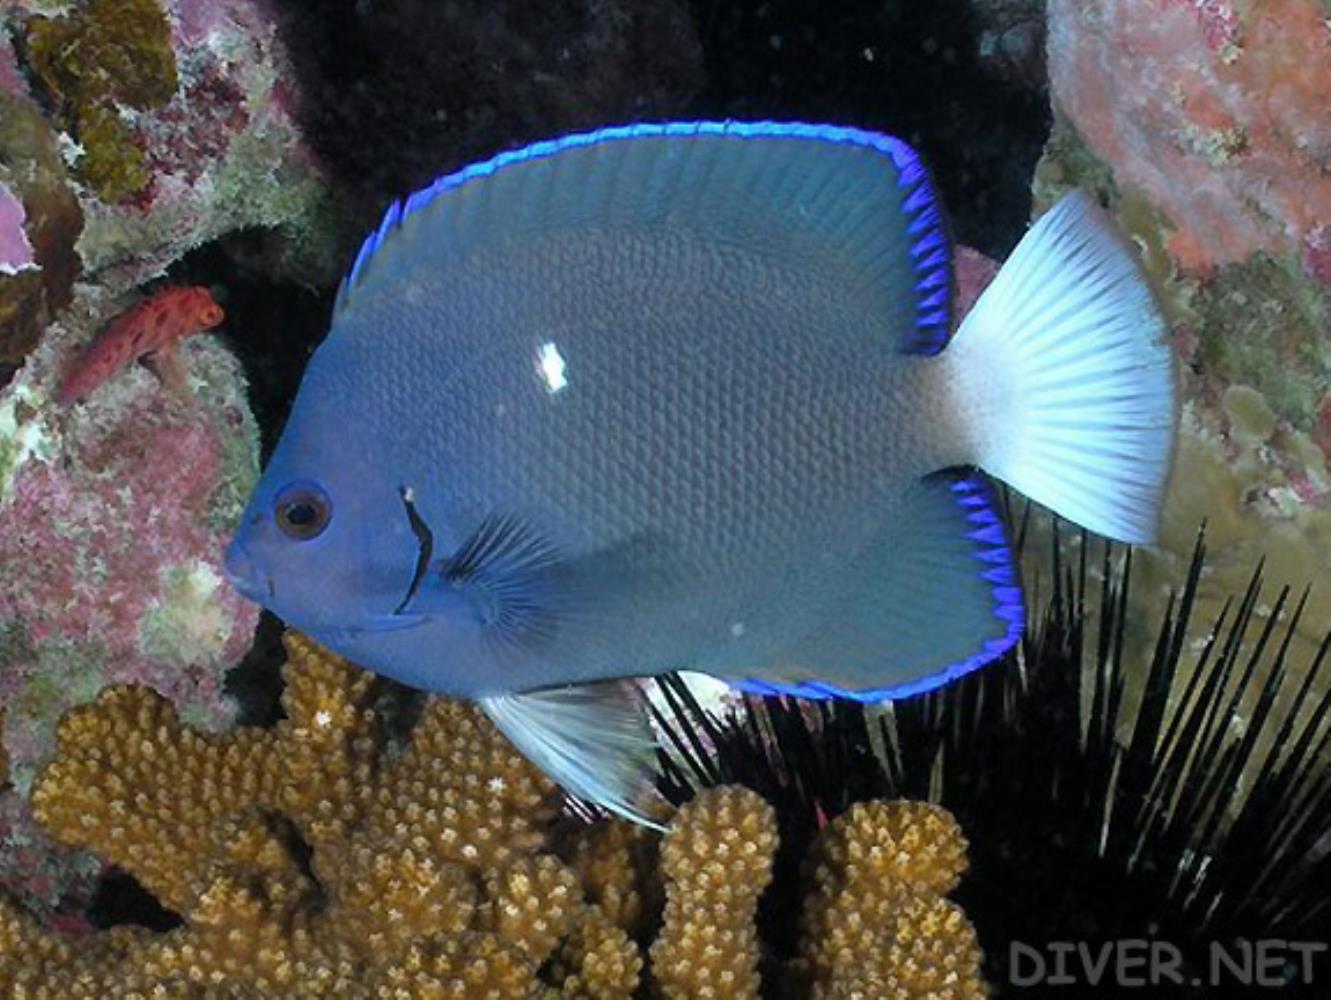 Clipperton Angelfish